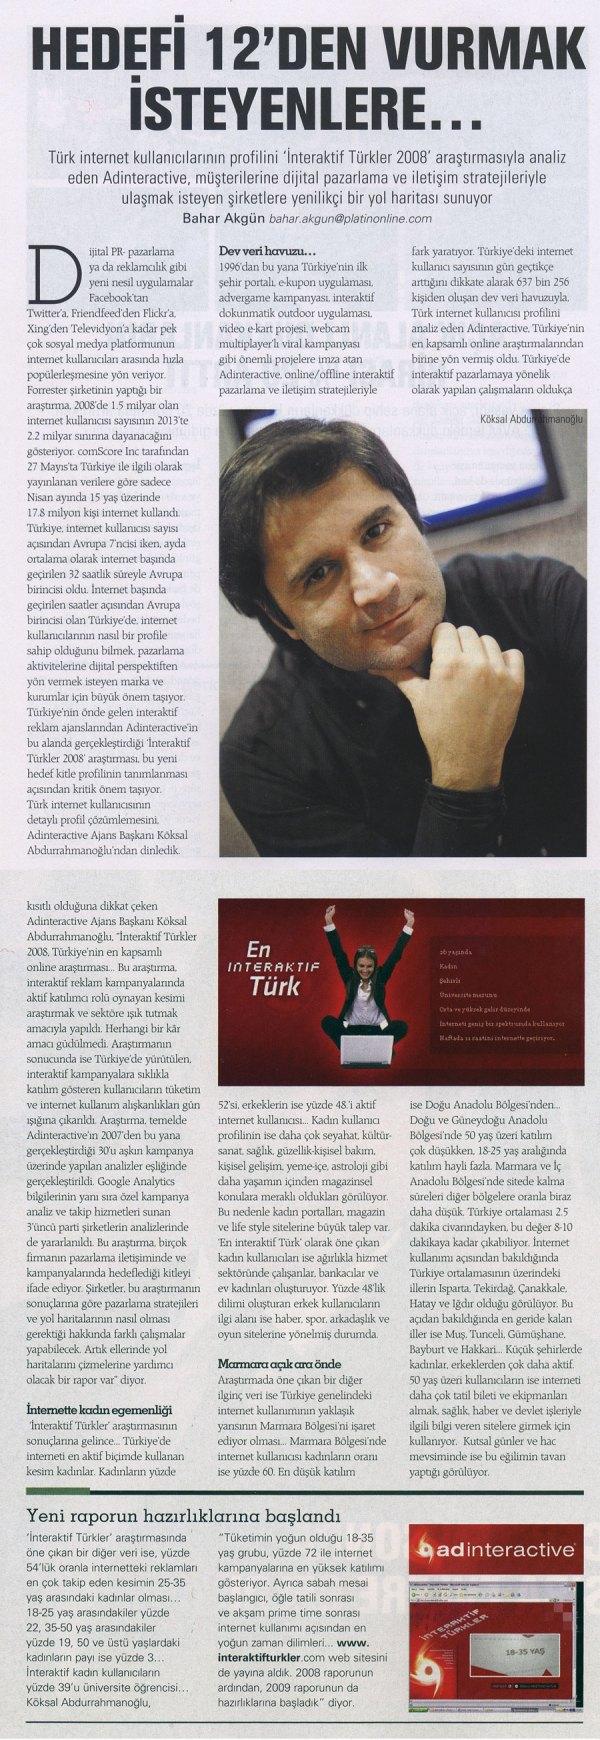 Platin_adinteractive-haber_09-2009